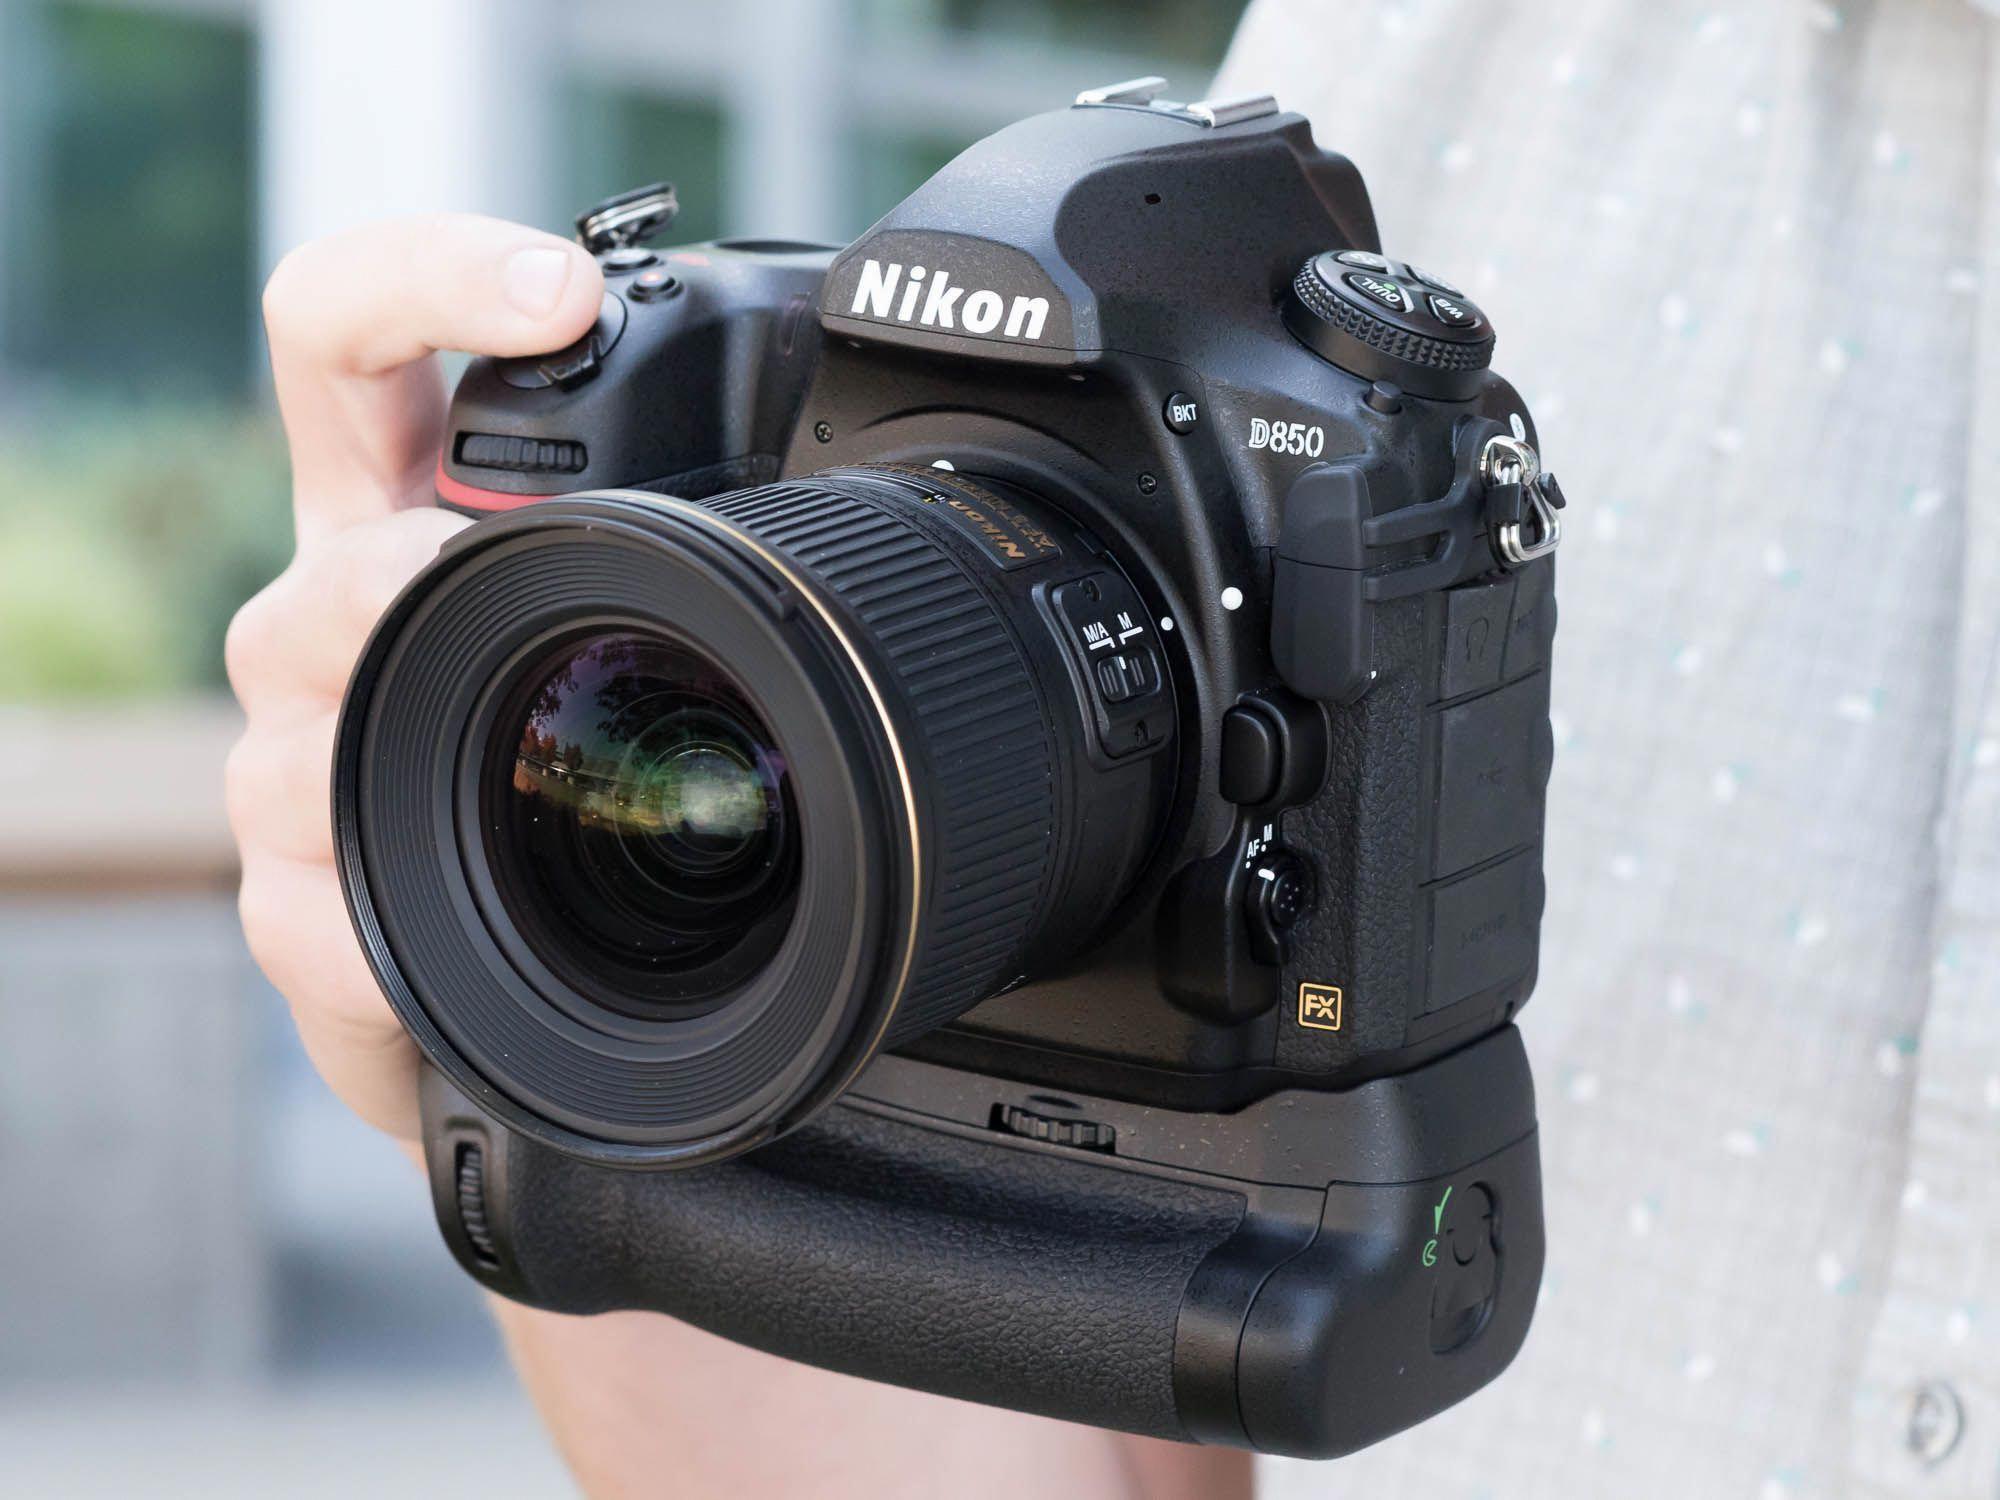 Camera Trickphoto Editingcamera Hacks Photo Manipulation Photoediting Best Digital Camera Camera Camera Nikon